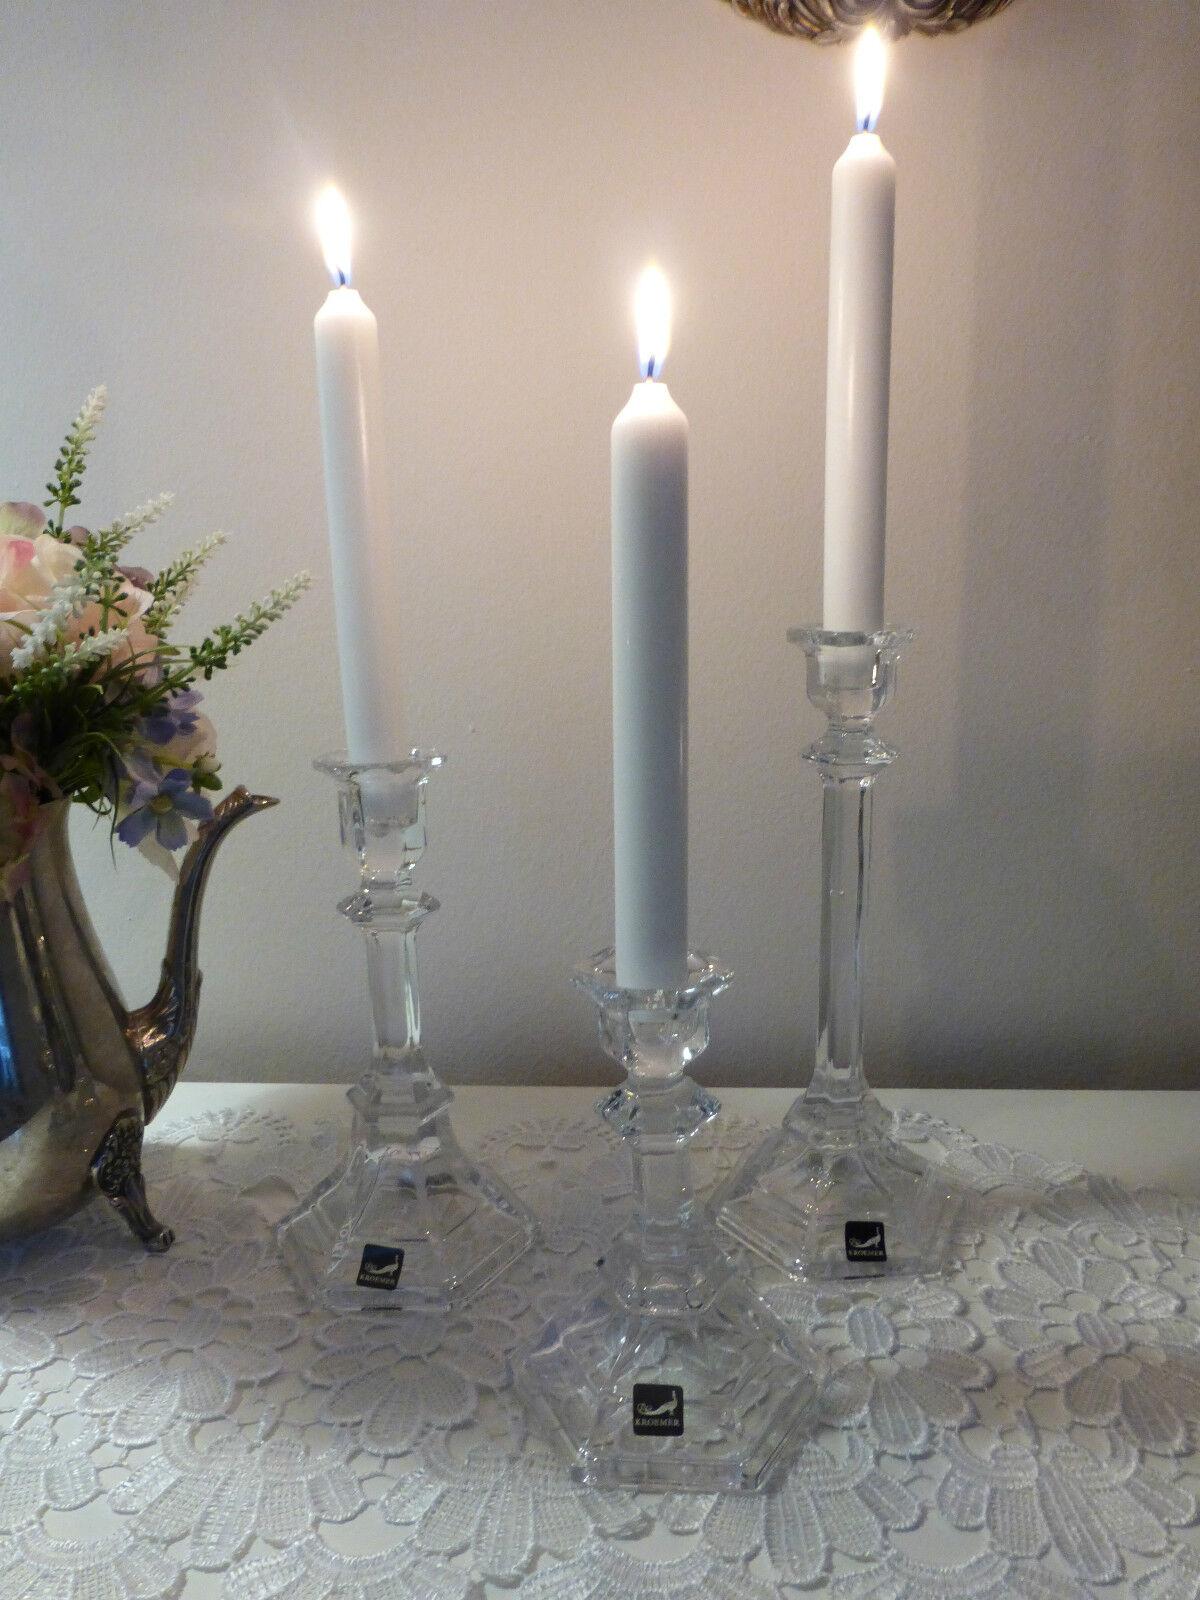 Kerzenständer Glas kerzenhalter glas glasleuchter kerzenständer klar glas 14 24cm krömer eur 6 95